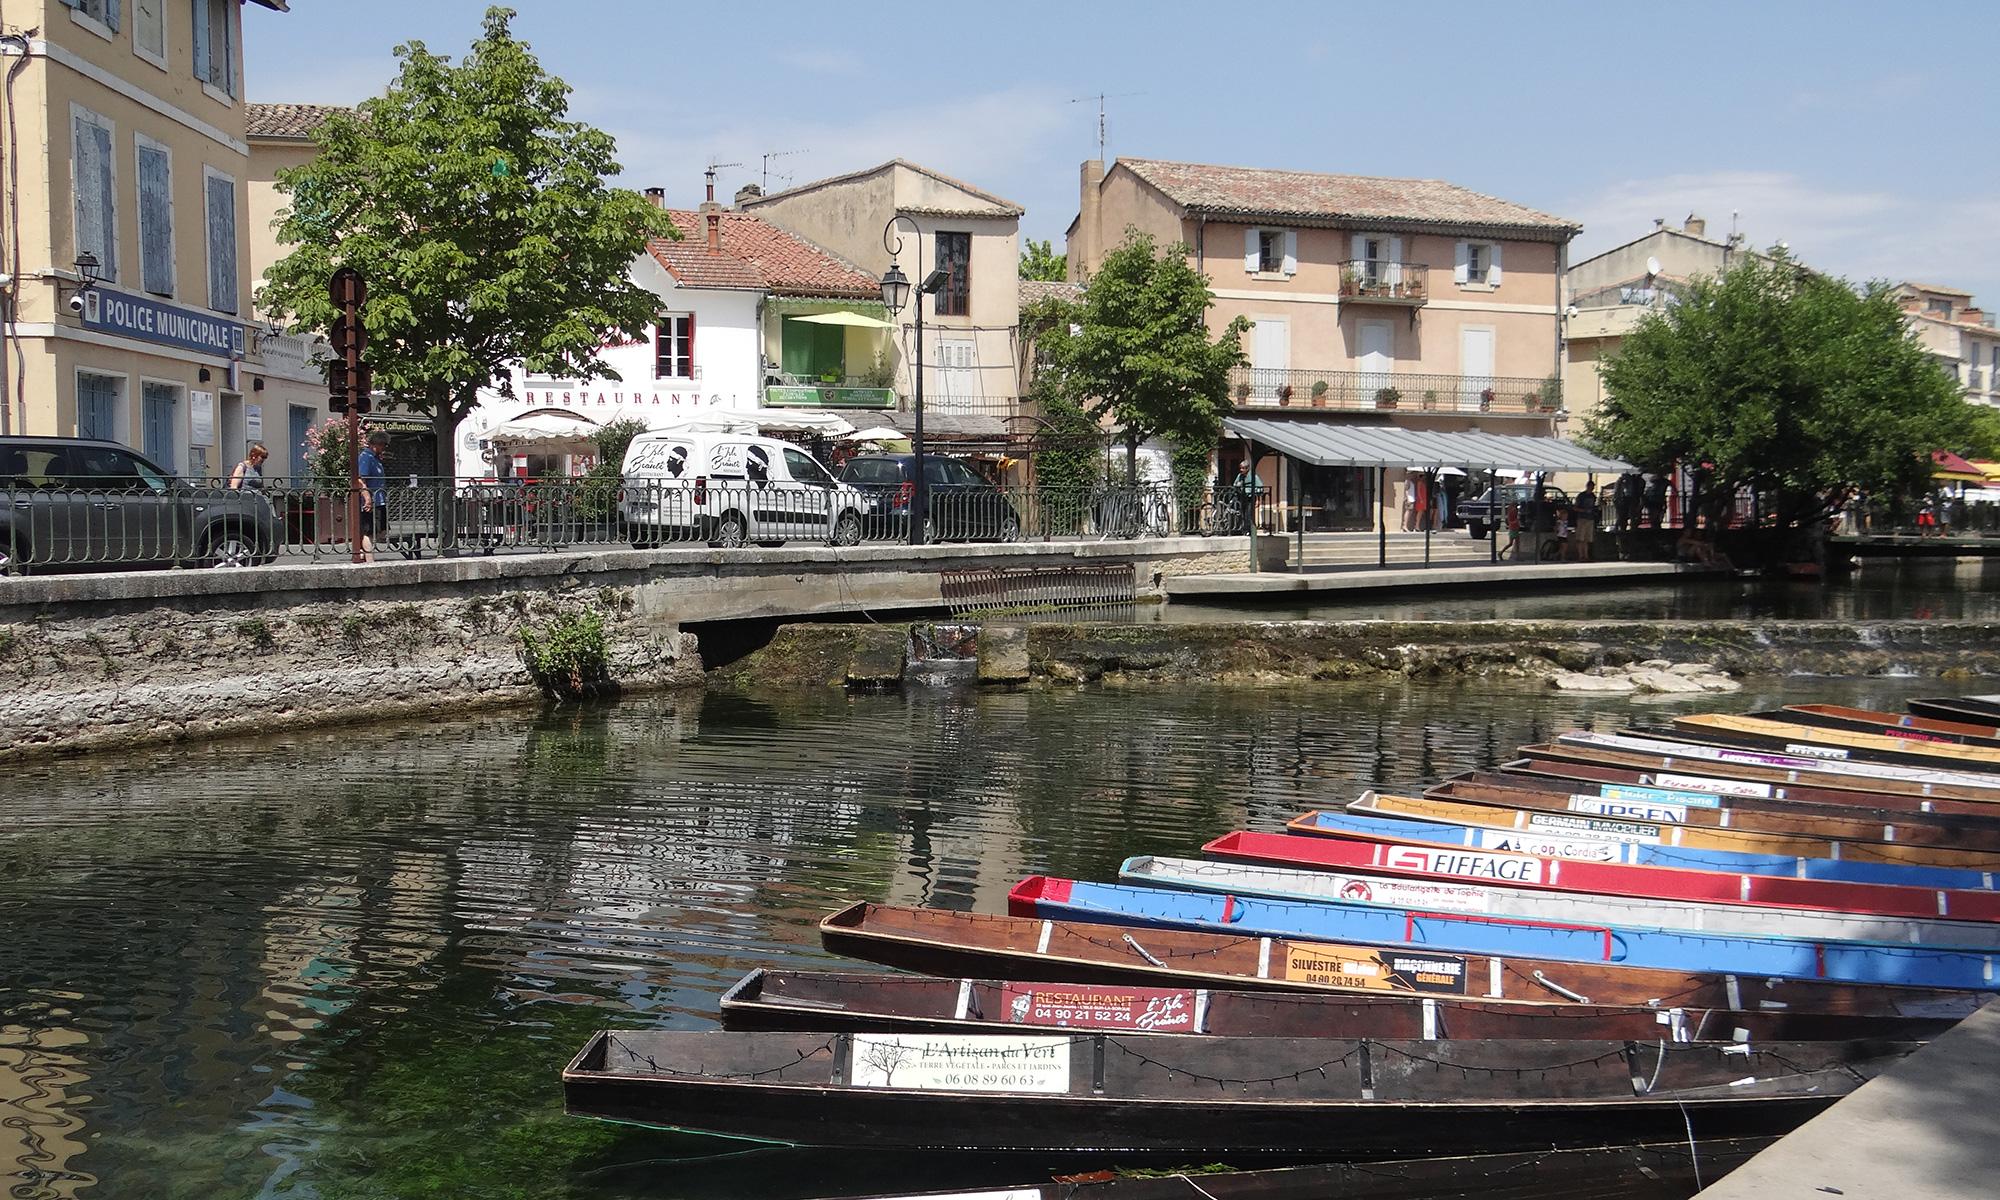 L'Isle-sur-la-Sorgue